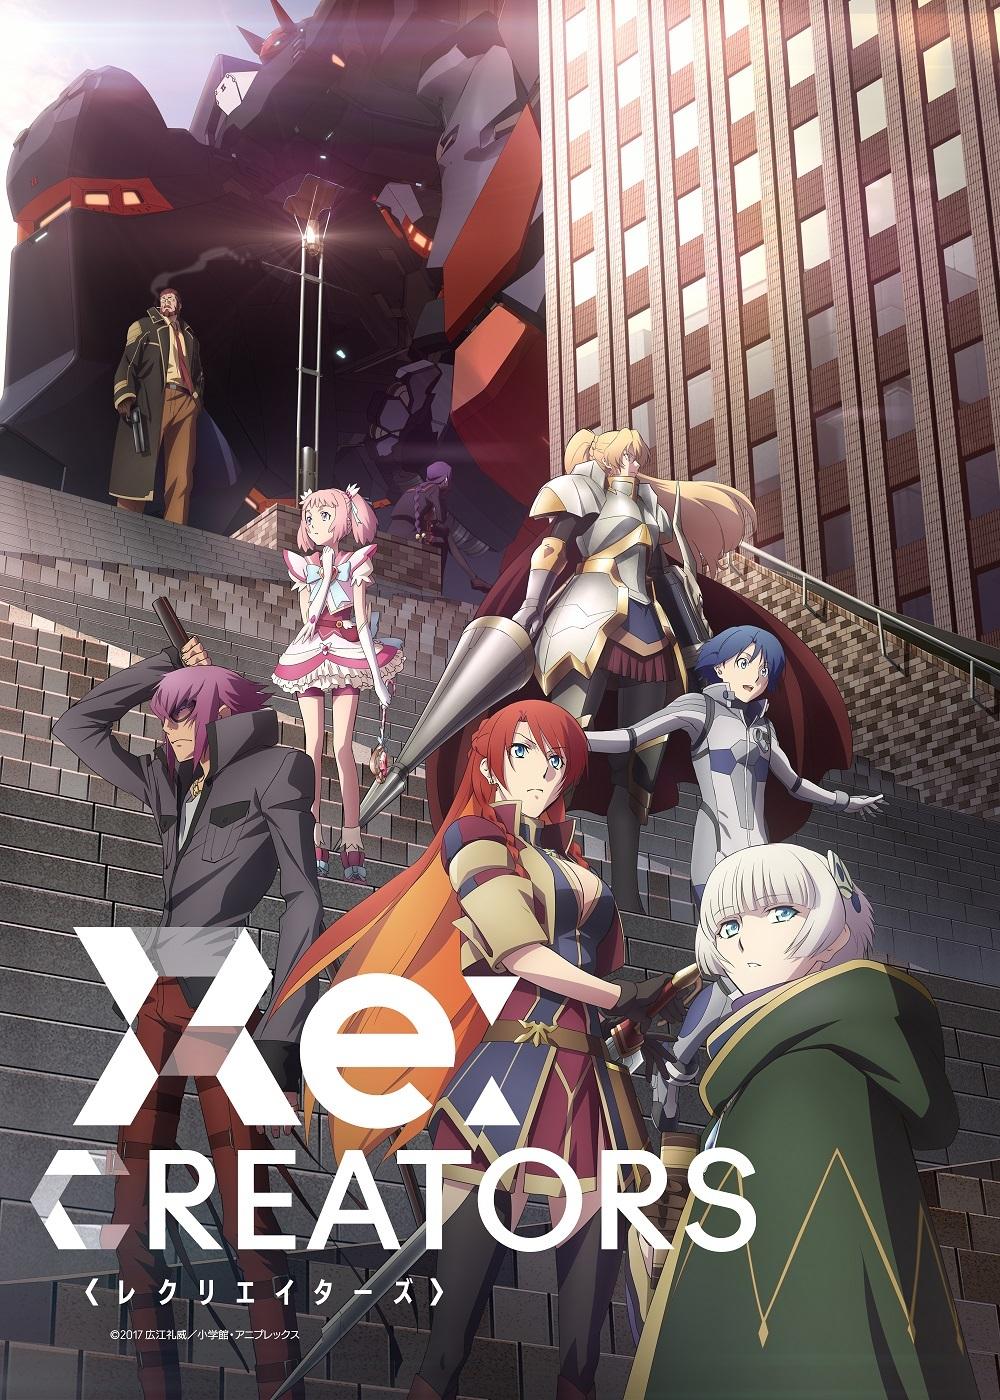 TVアニメ『Re:CREATORS(レクリエイターズ)』 (C)2017 広江礼威/小学館・アニプレックス